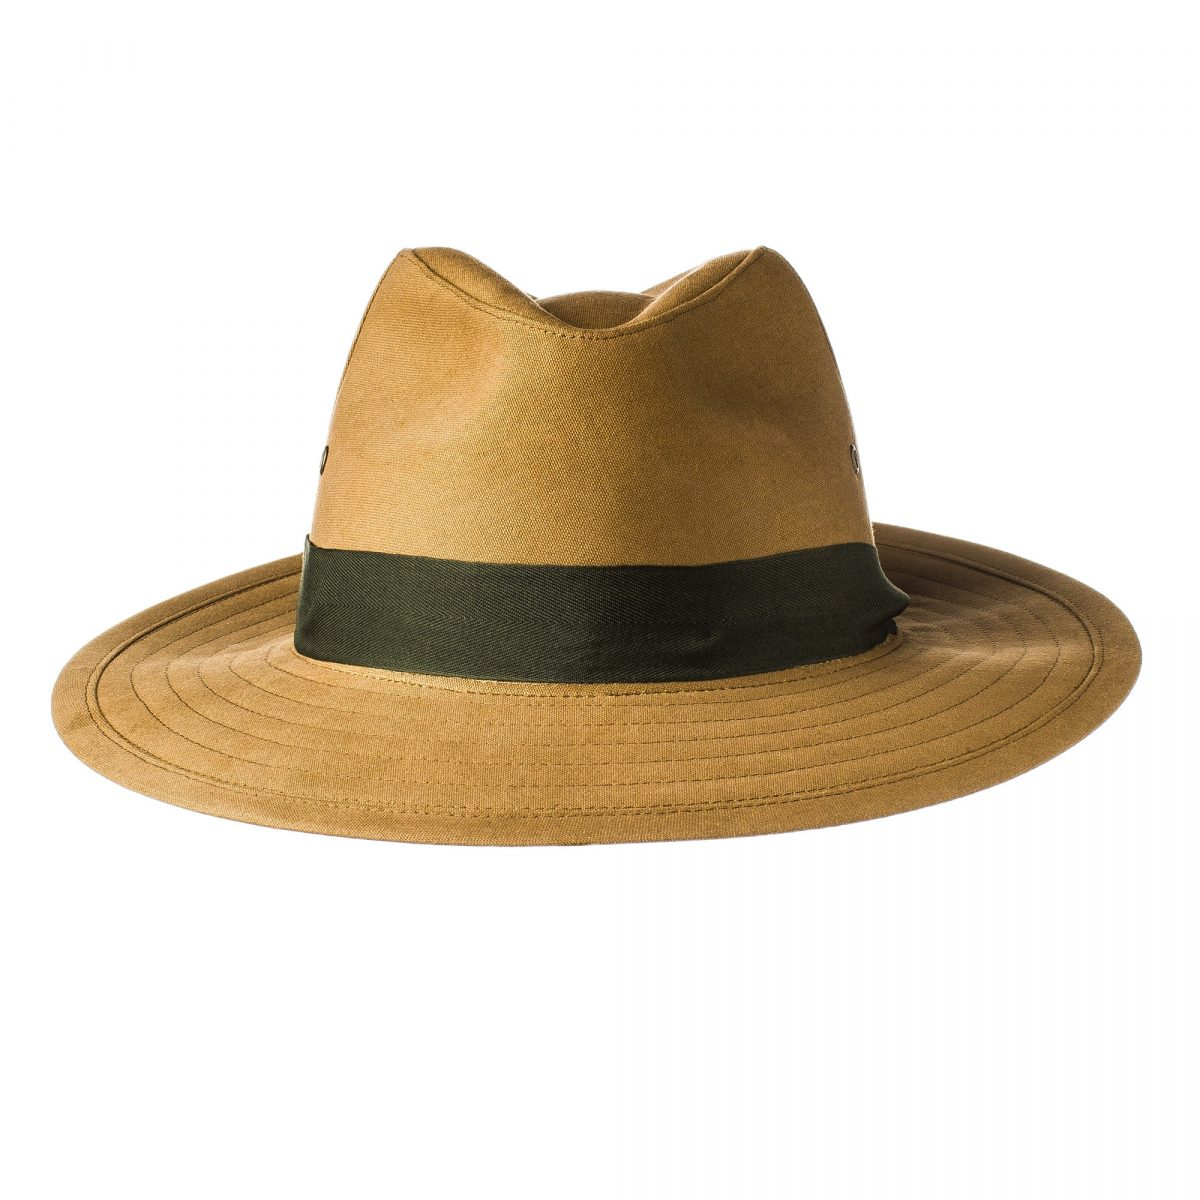 wr_co_safari_hat-2086-edit